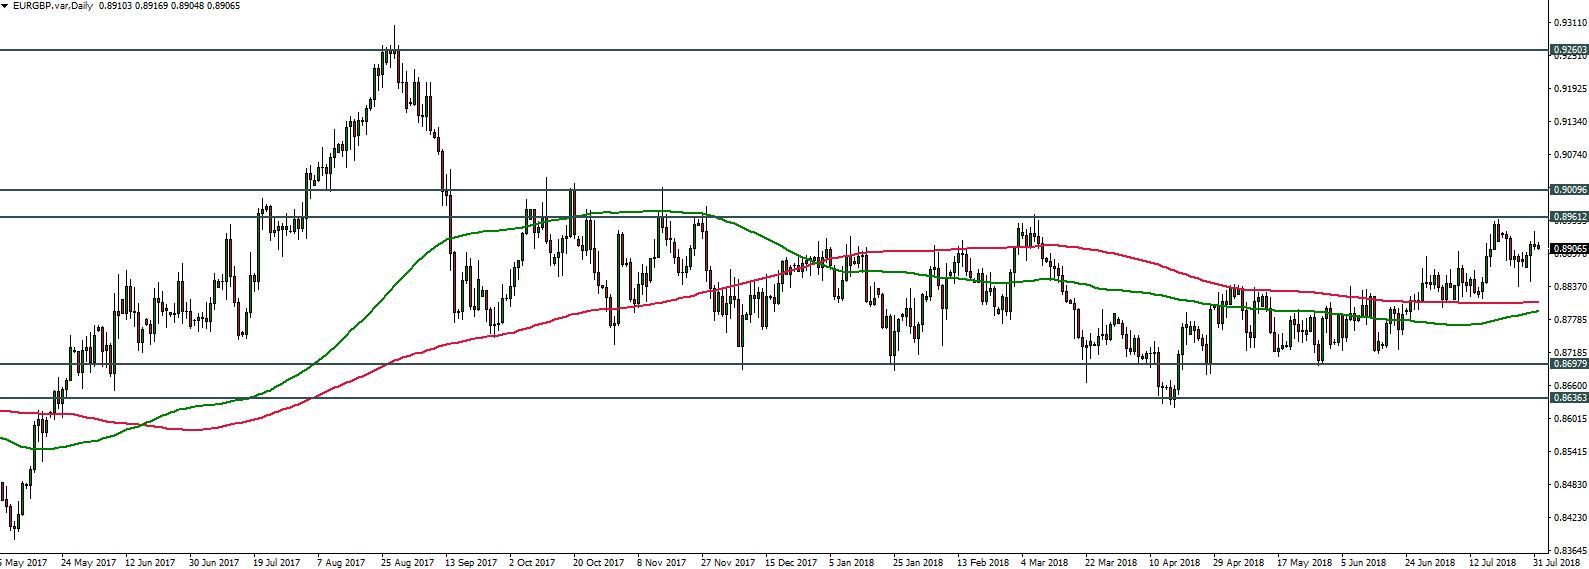 EURGBP - 01.08.2018 - Daily